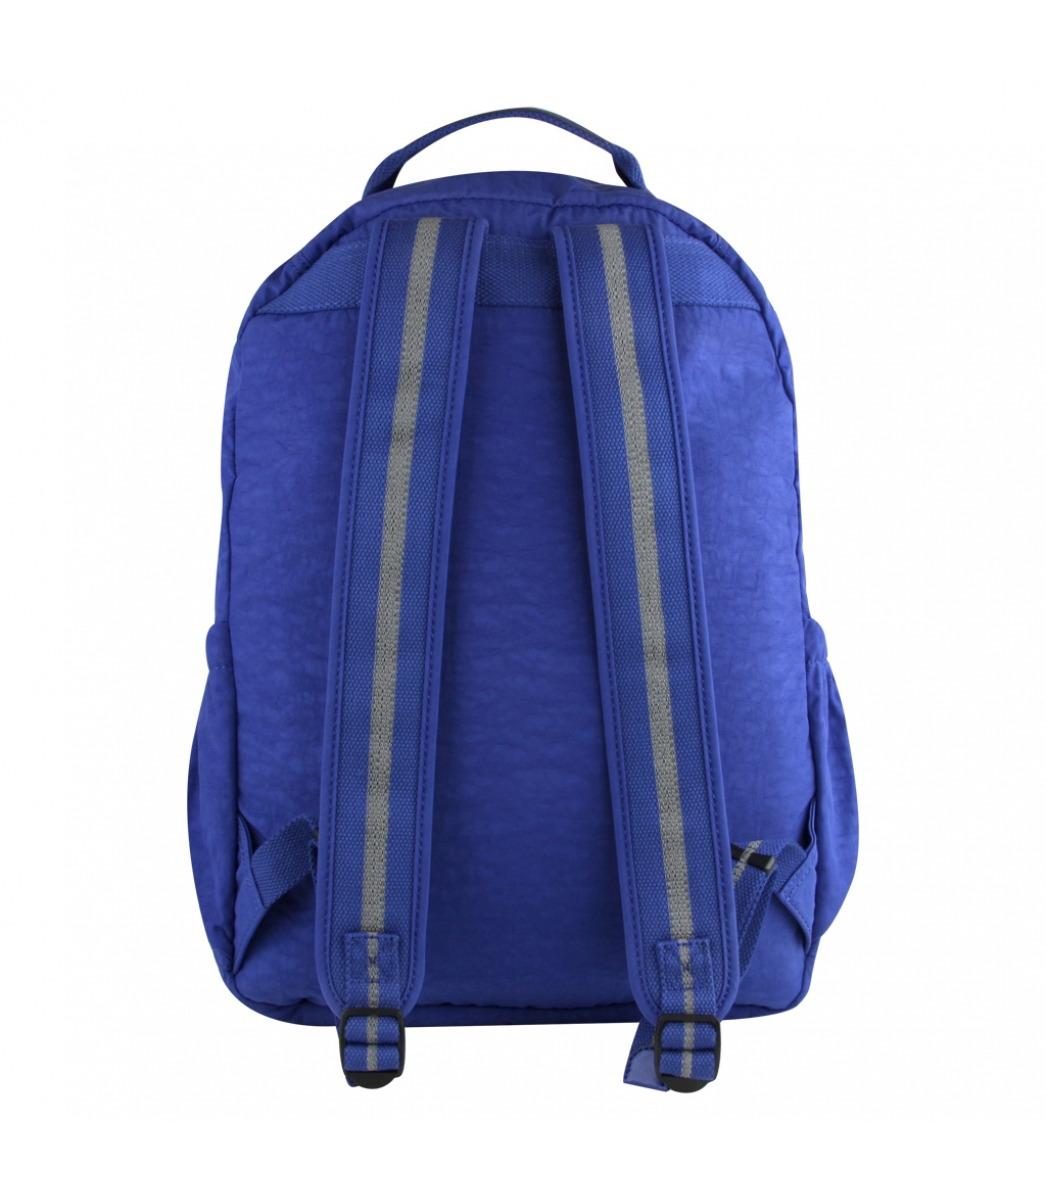 01149b86c Mochila Kipling Seoul Go Azul Broken Blue - R$ 699,00 em Mercado Livre